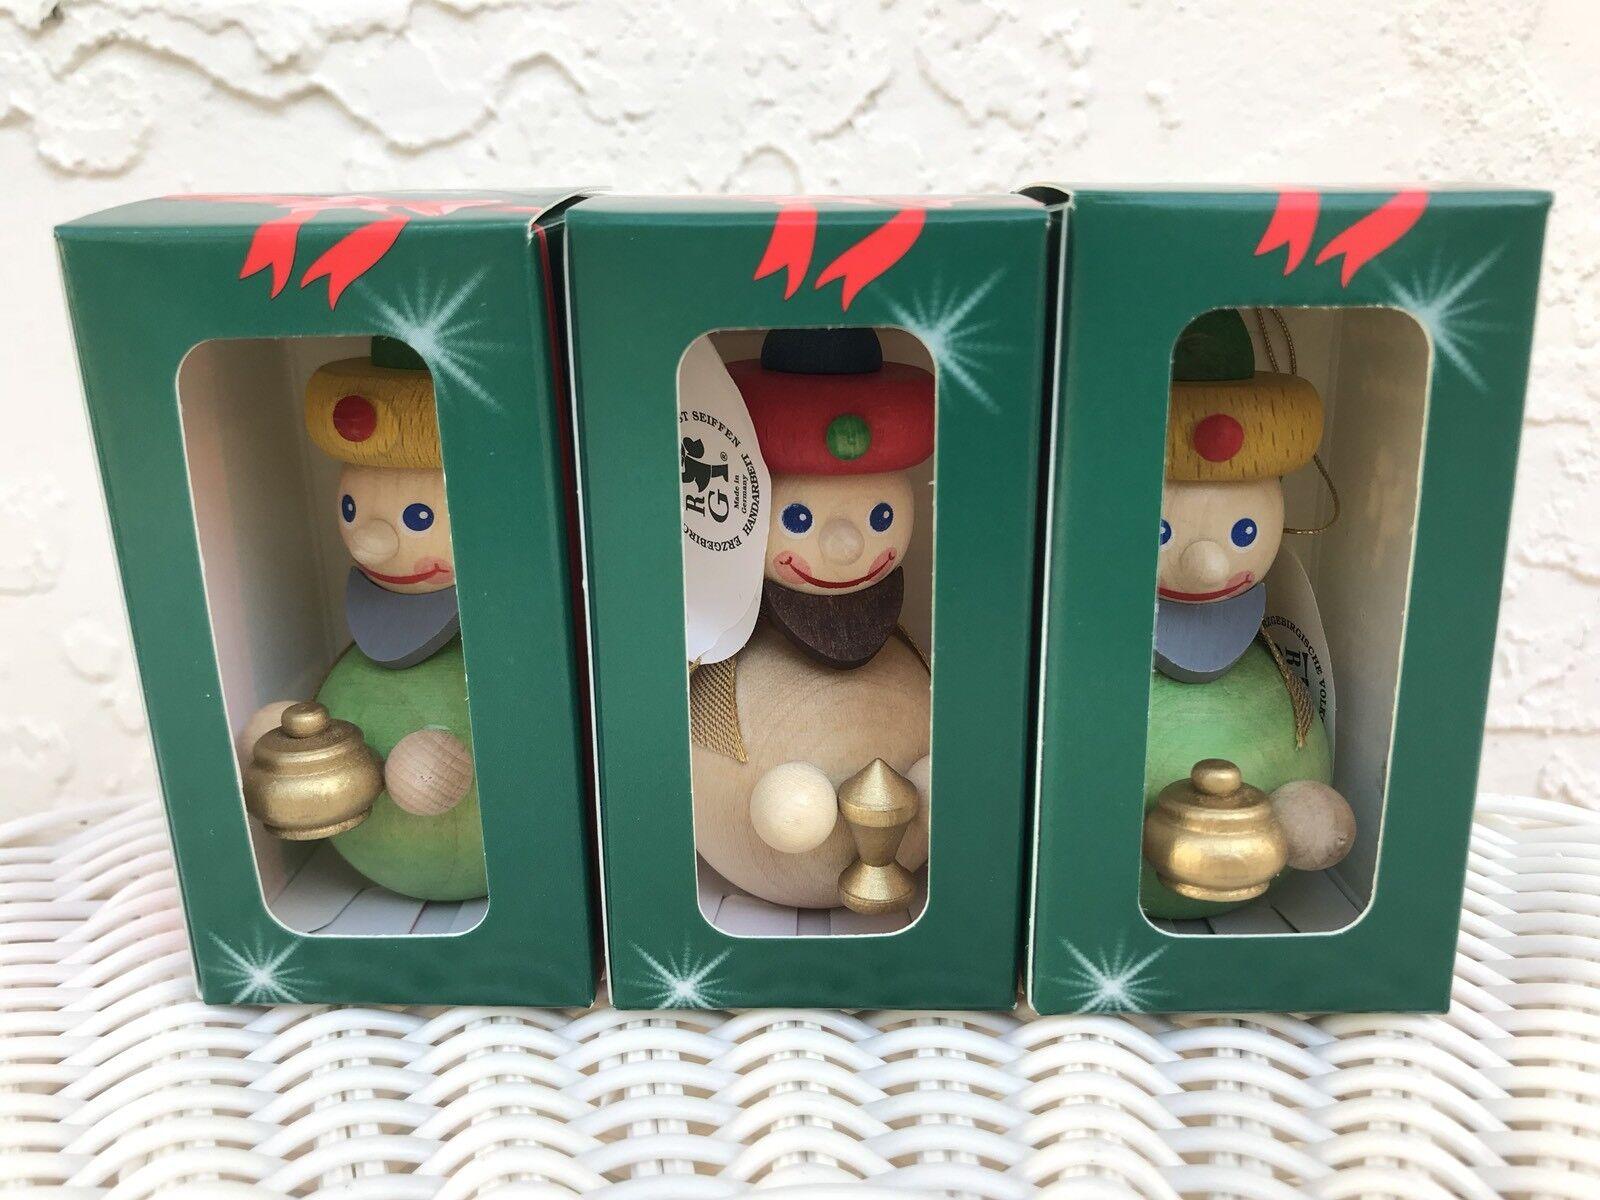 Set of 3 Glaesser 3 3 3 Wise Men Wood Christmas Ornament Handmade in Germany 5fd2cd